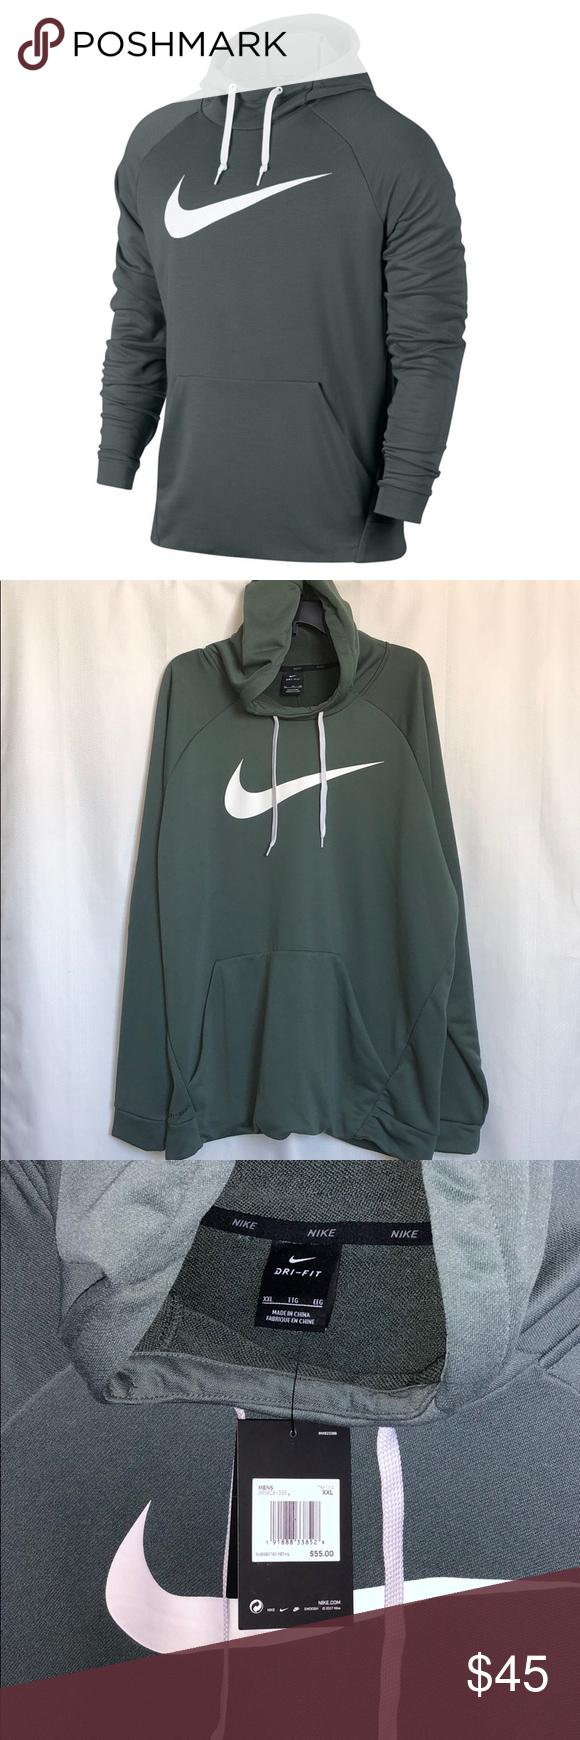 Men S Nike Dri Fit Pullover Swish Hoodie Nike Dri Fit Hoodies Nike [ 1740 x 580 Pixel ]